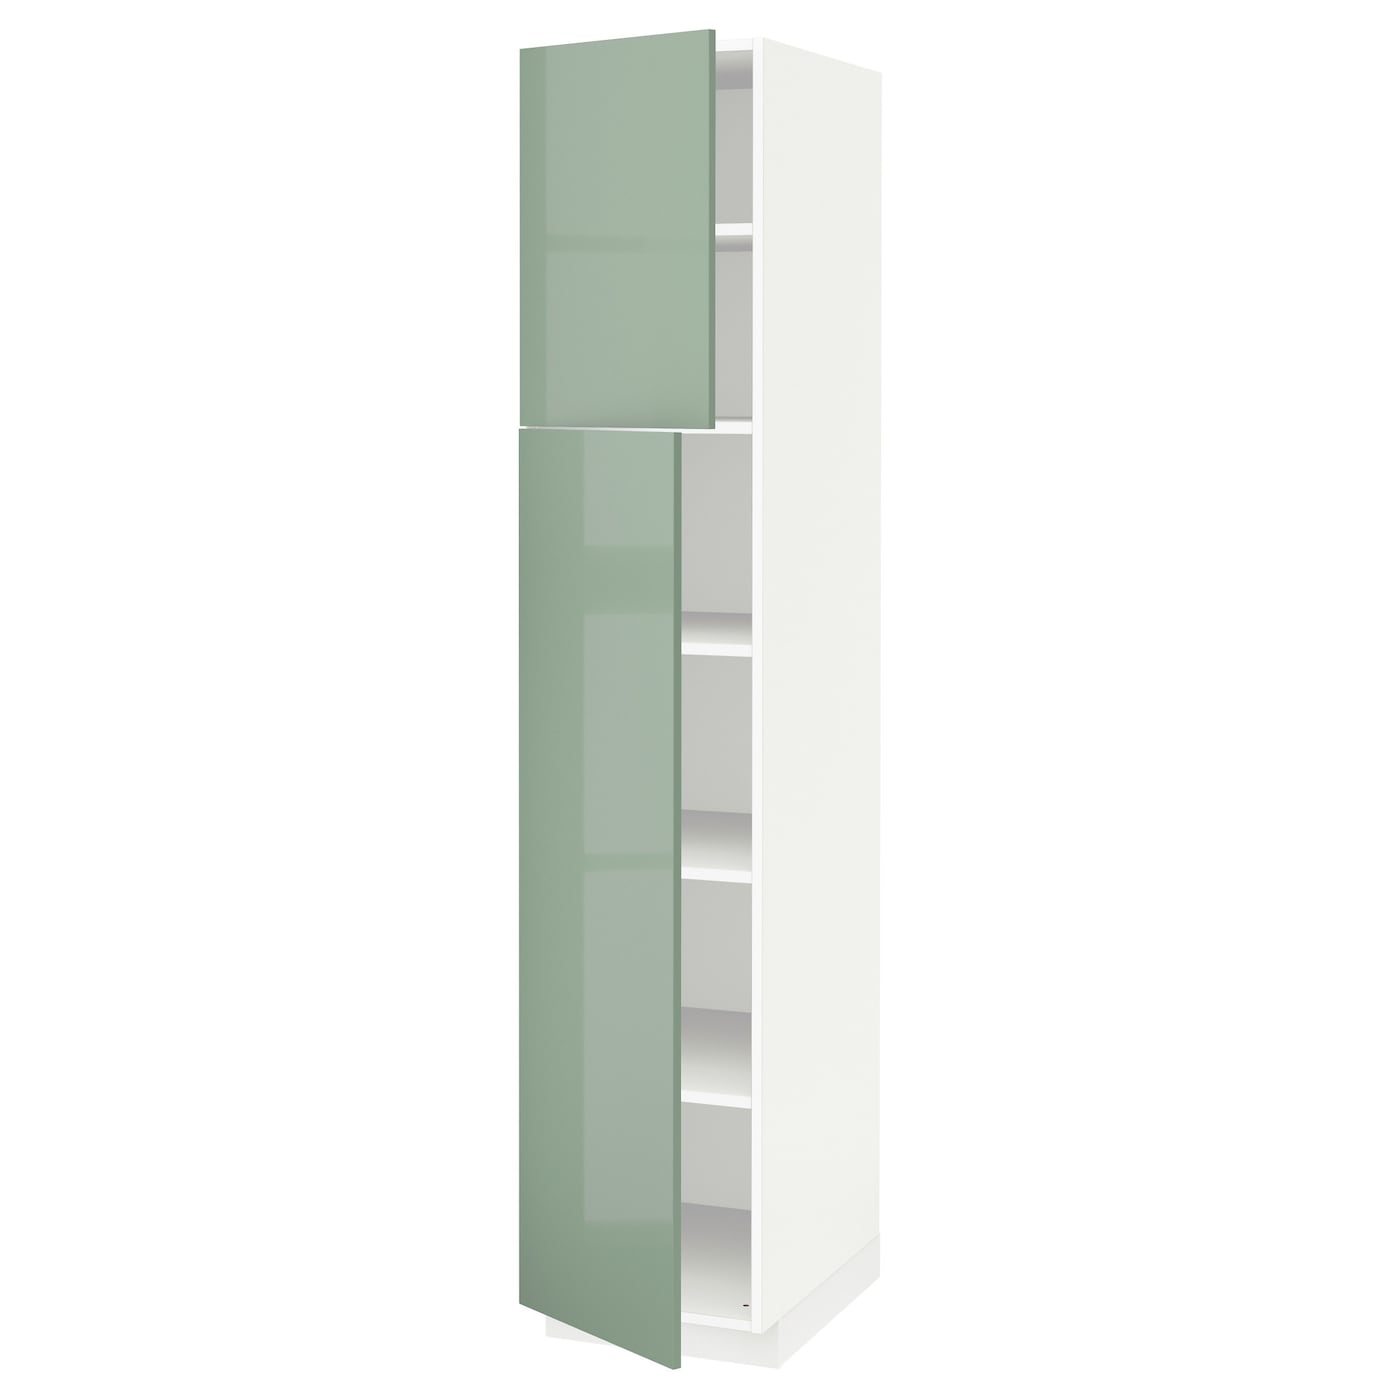 Metod armario alto cocina baldas puertas blanco kallarp Puertas de cocina ikea